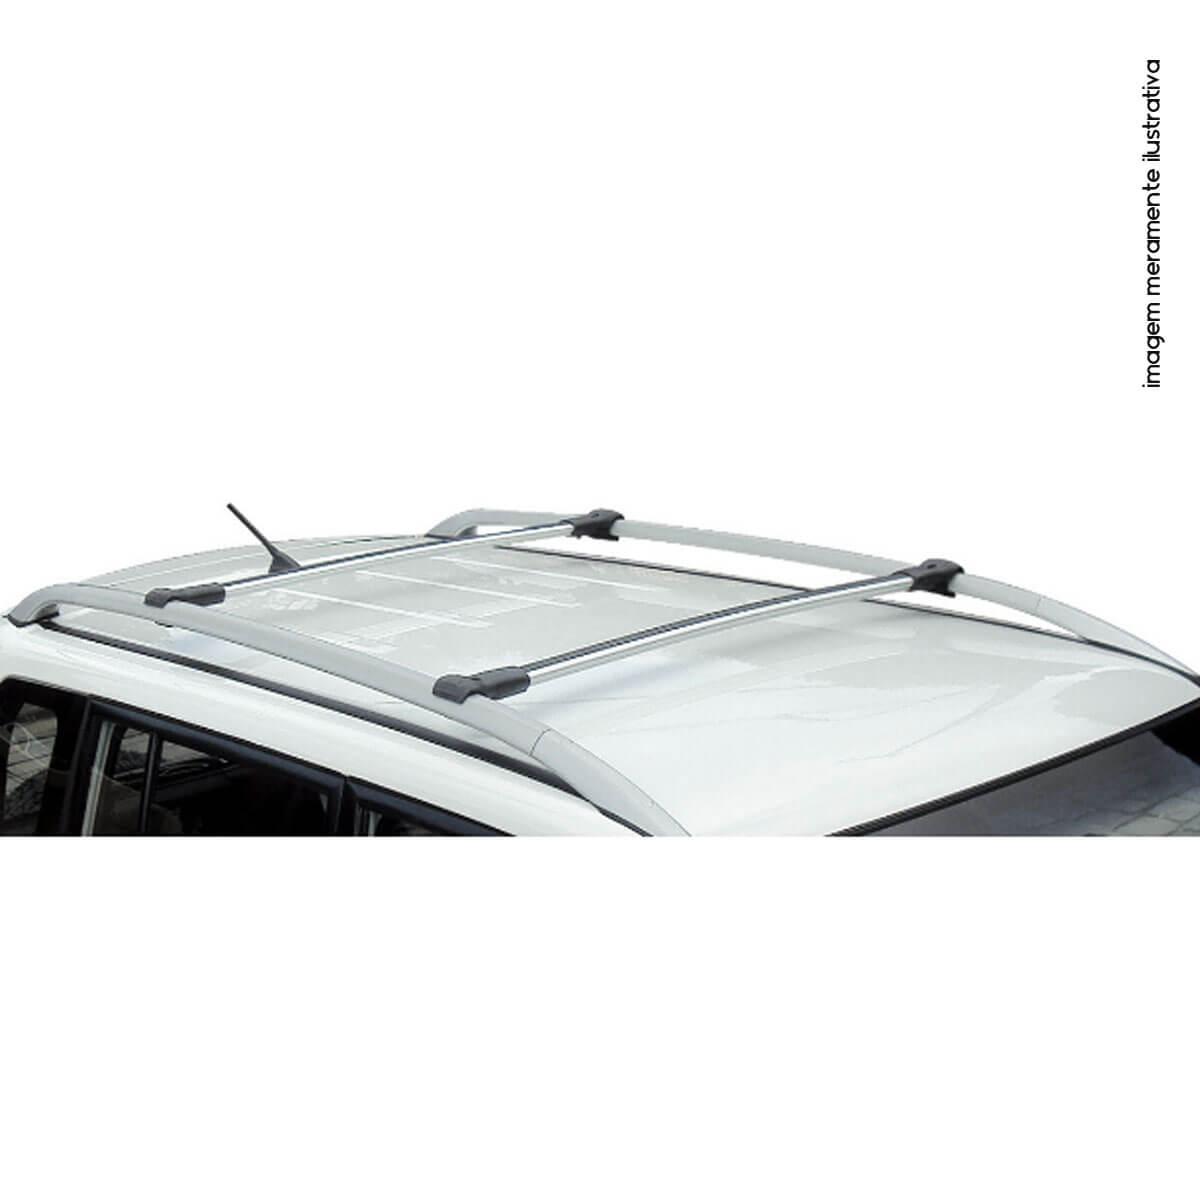 Travessa rack de teto larga alumínio Nova S10 cabine dupla 2012 a 2018